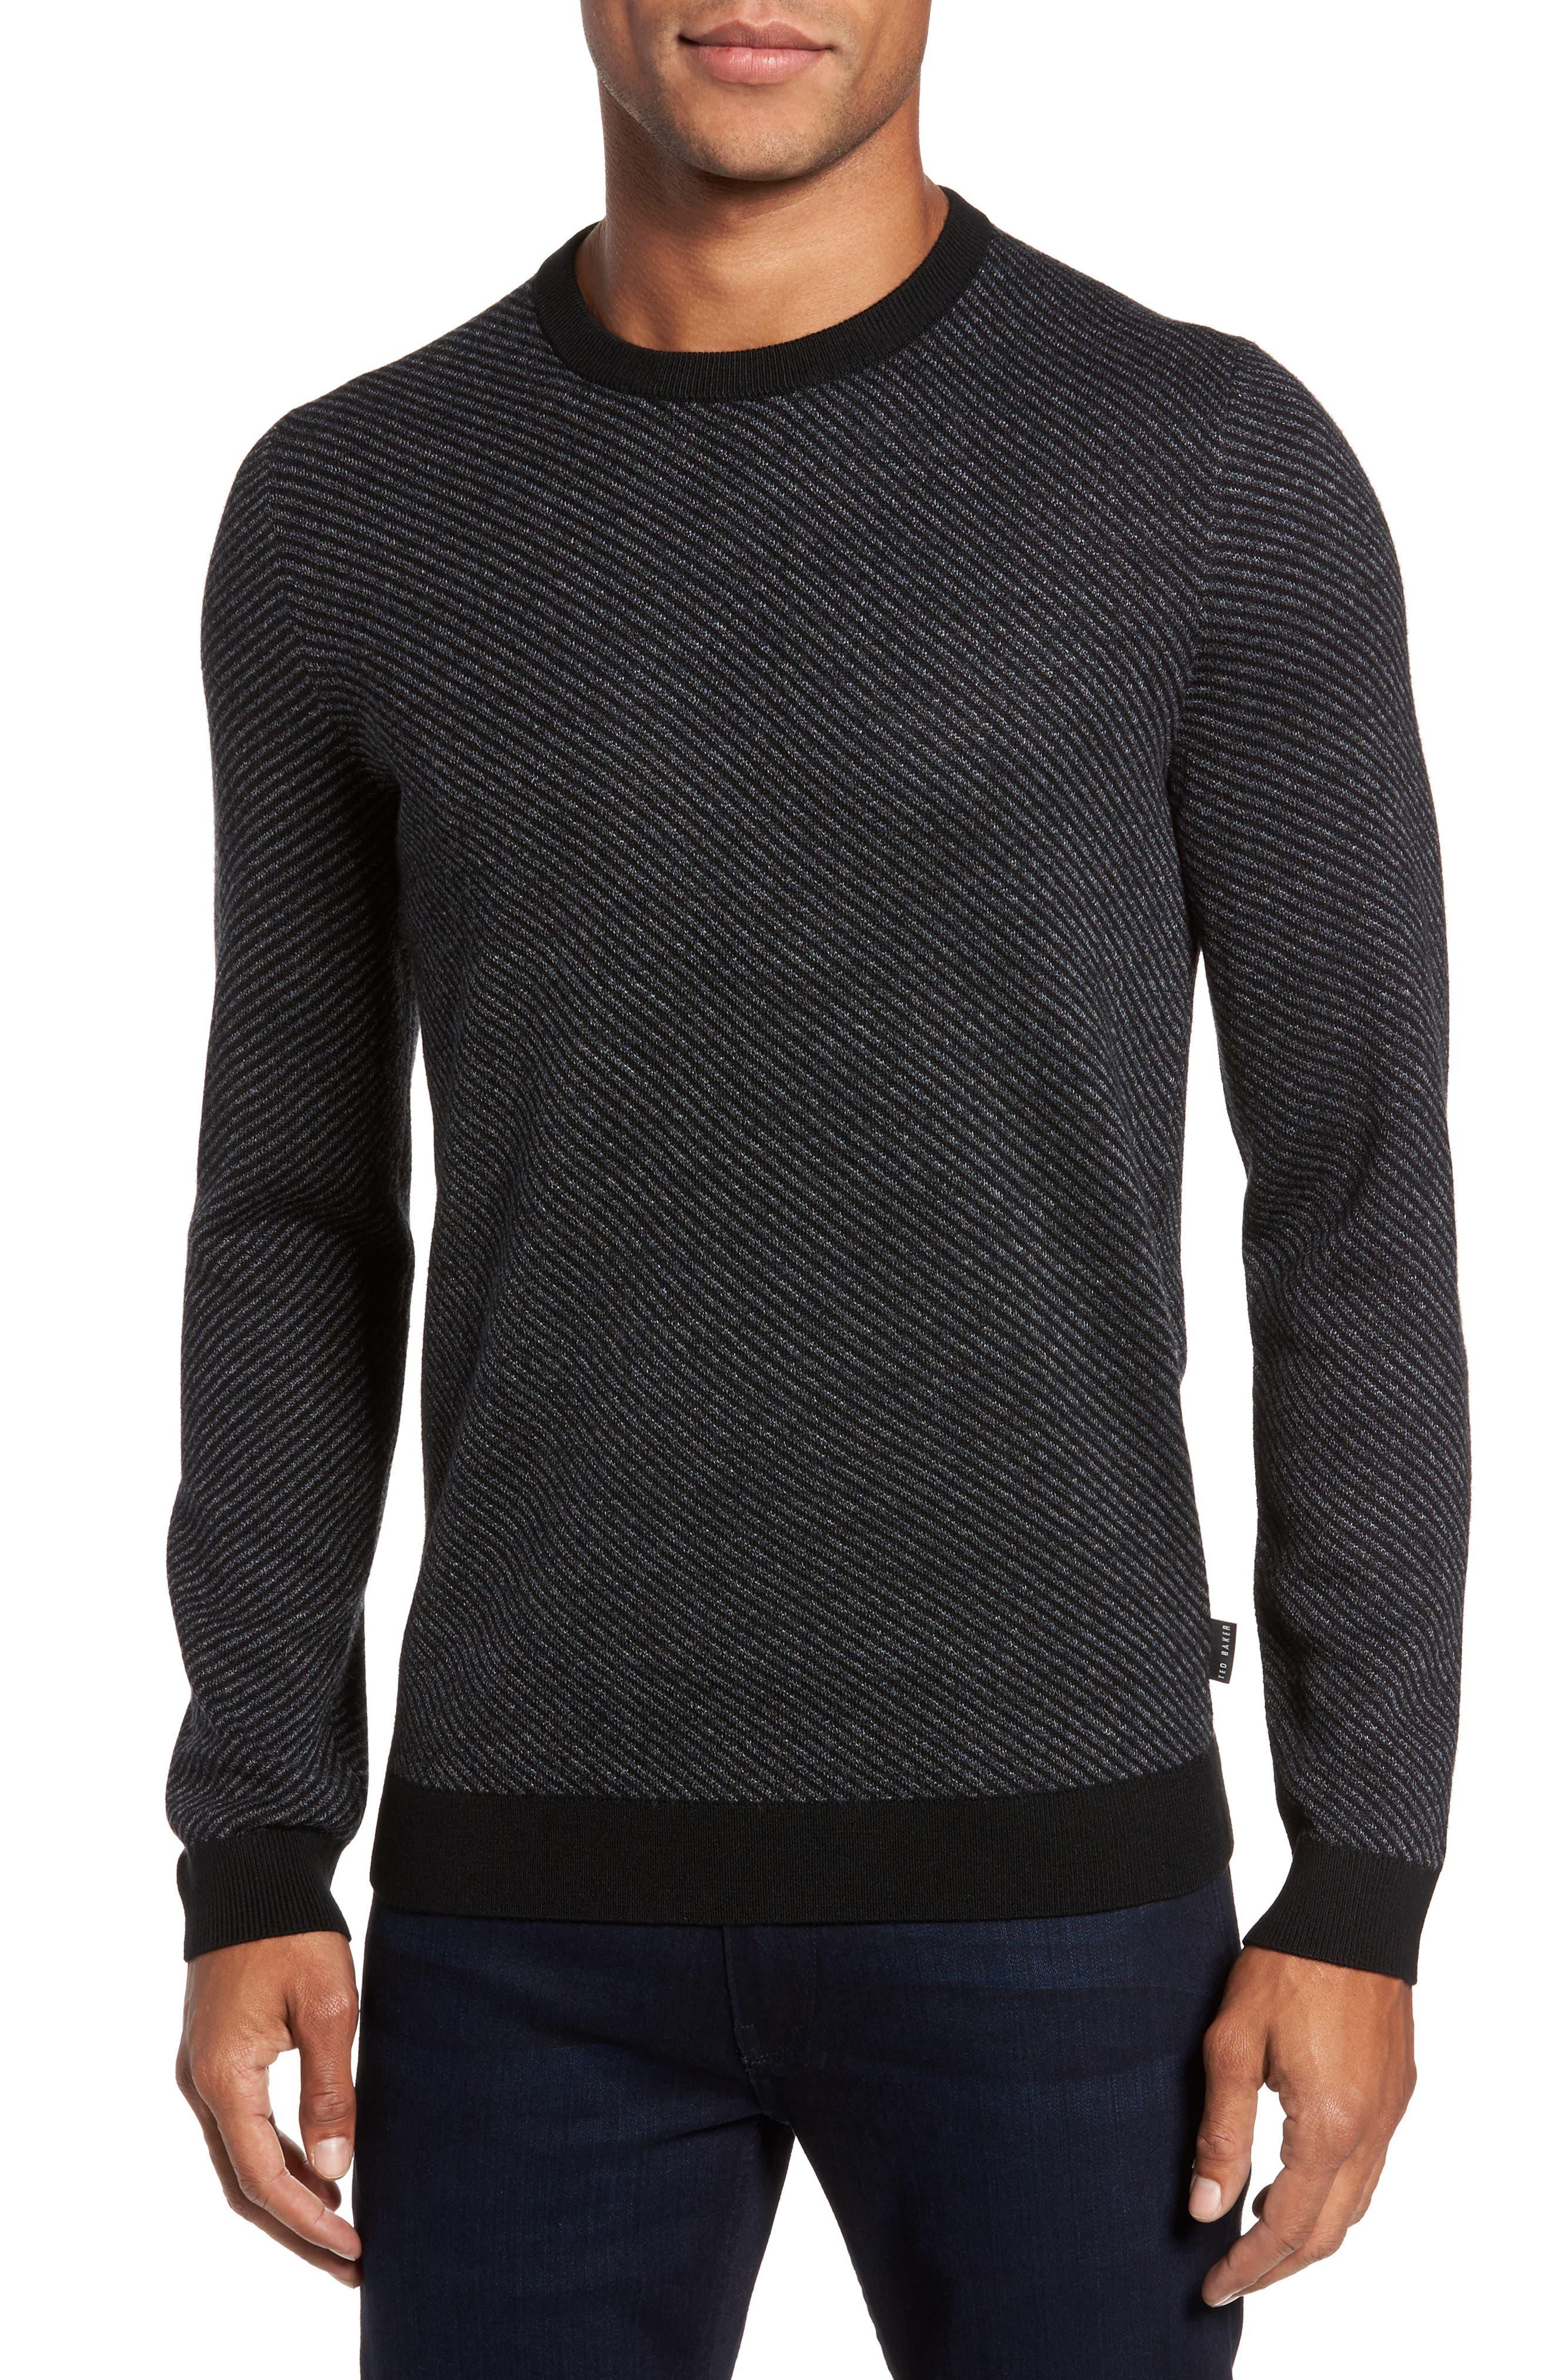 Cinamon Interest Stitch Crewneck Sweater,                             Main thumbnail 1, color,                             001